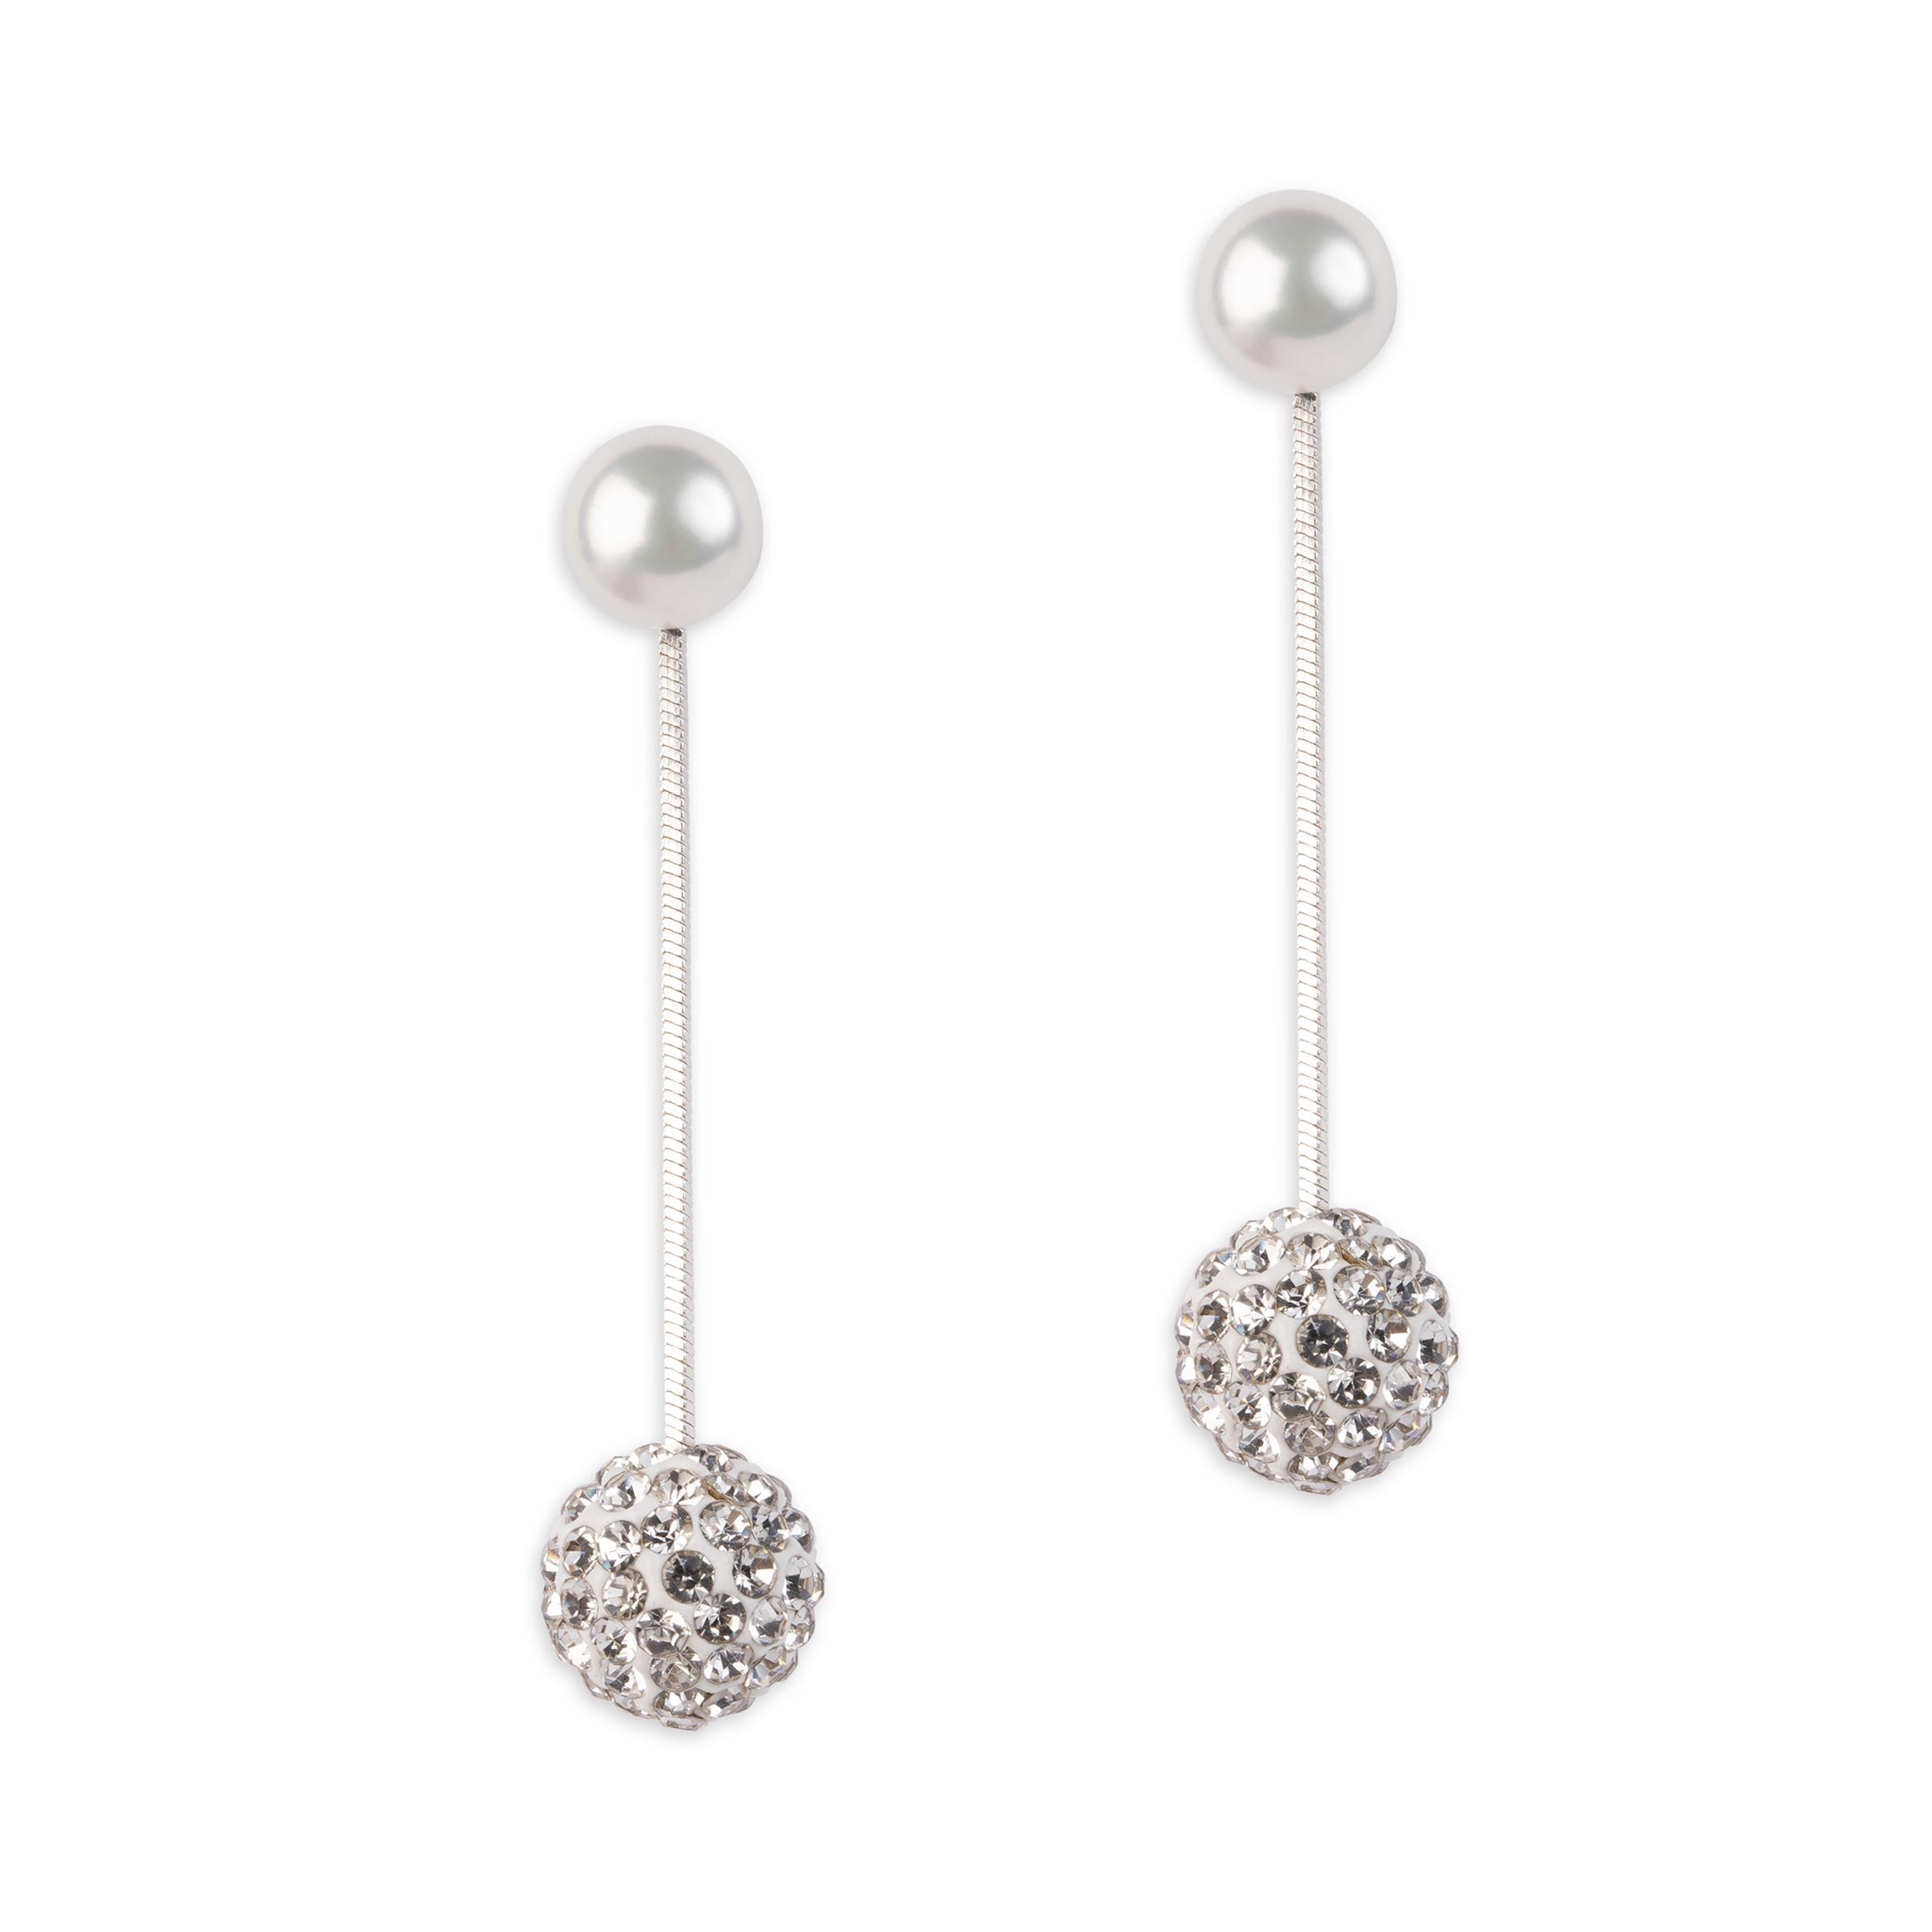 Damsmycke pfg Stockholm Pearls for Girls-Dizzie Earring 96270-02